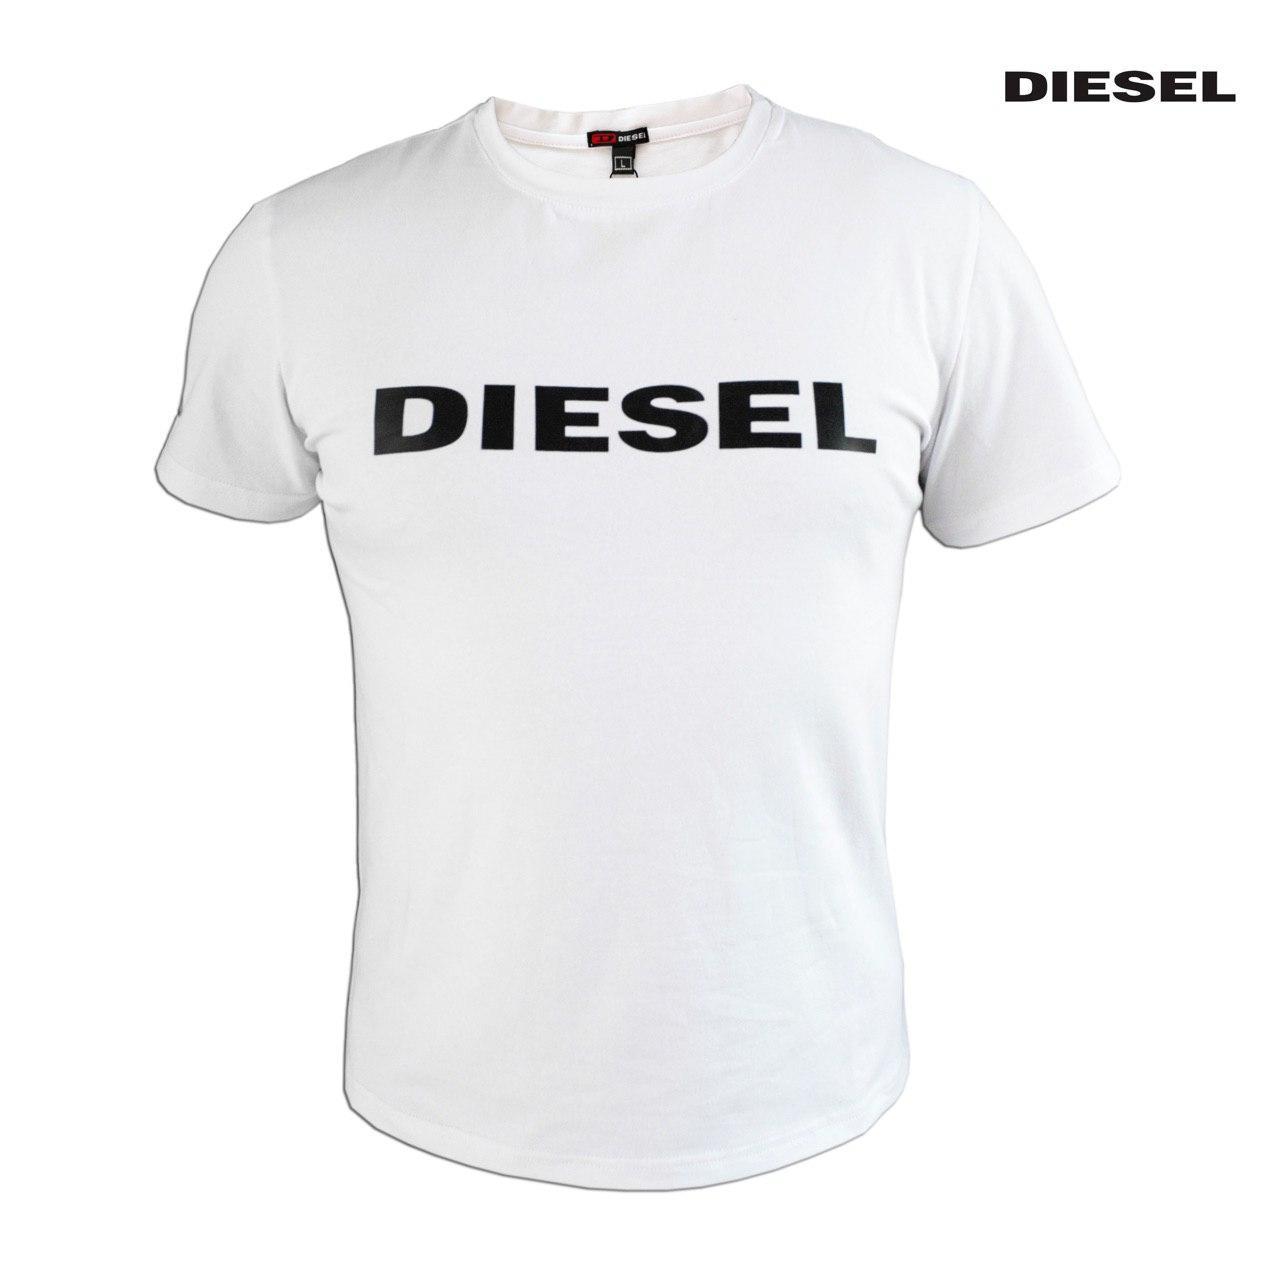 Мужская футболка. Реплика DIESEL Мужская одежда